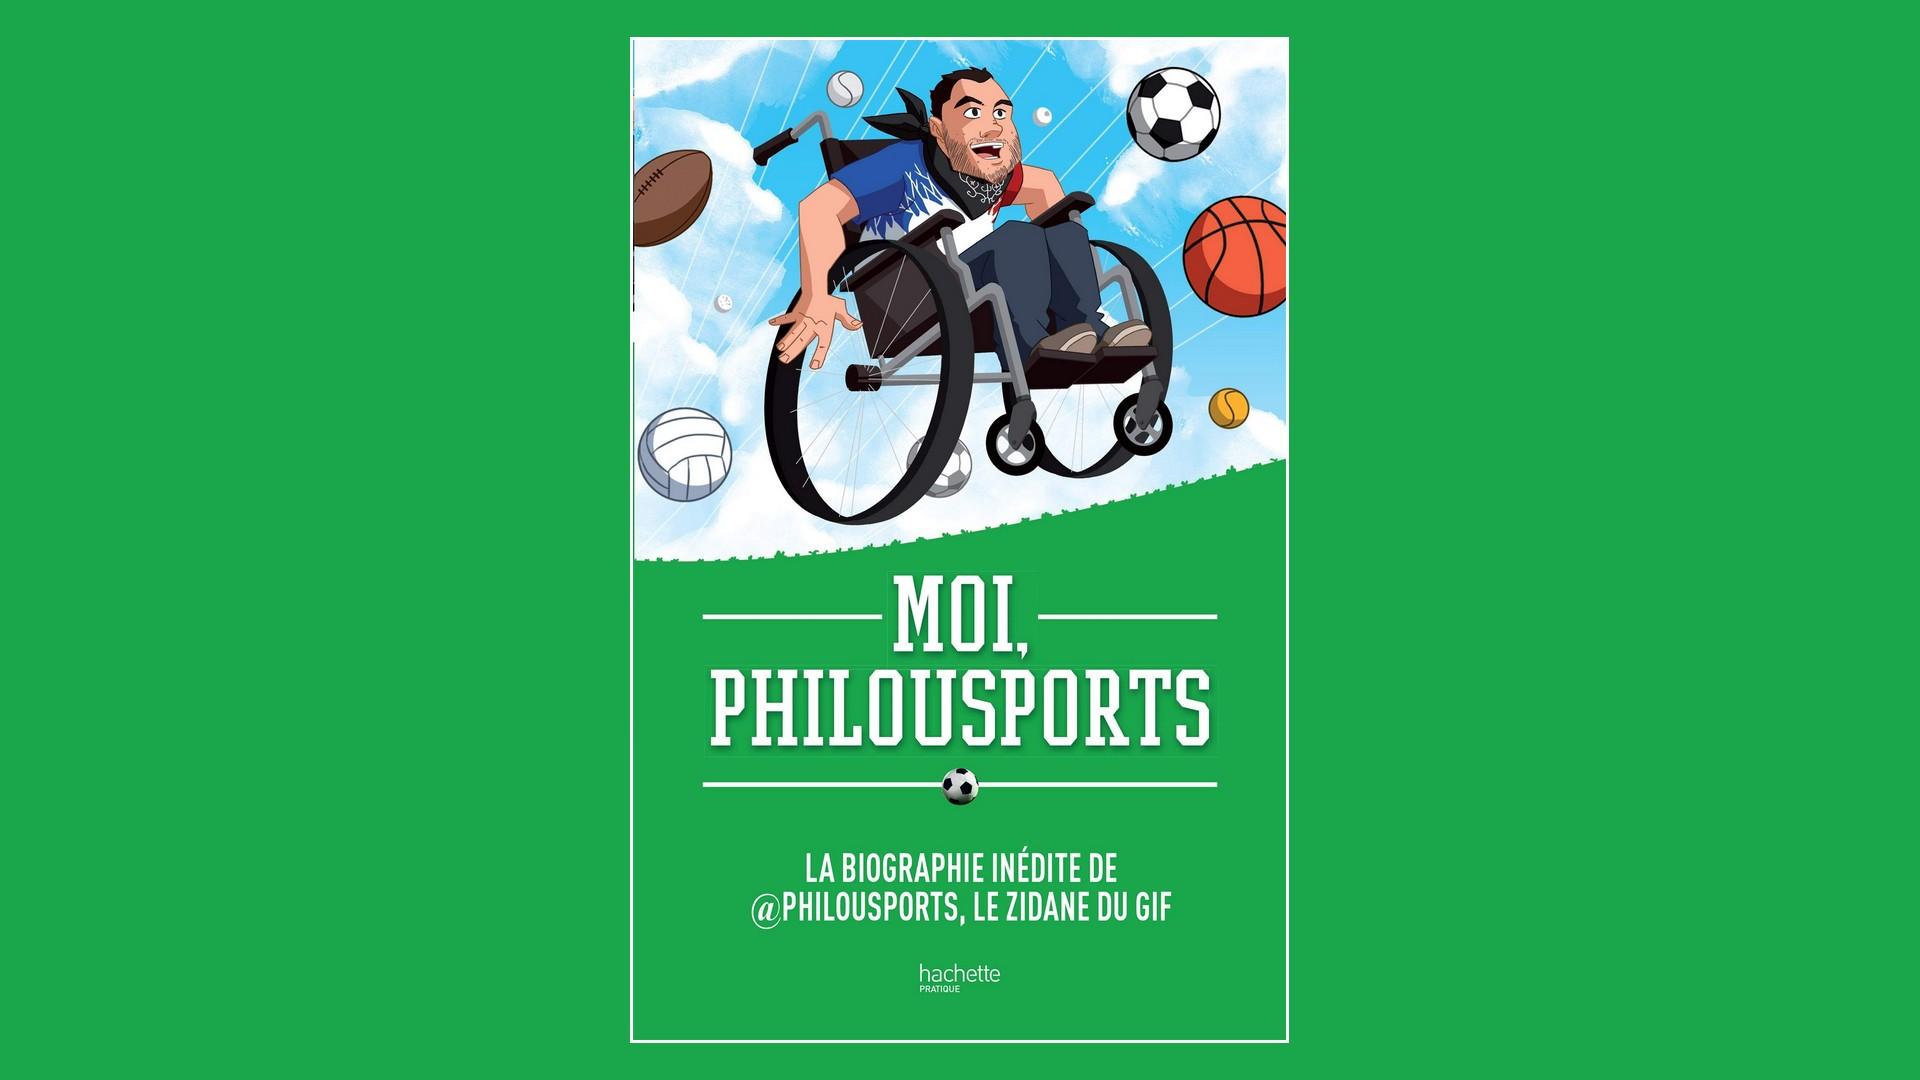 Moi Philousports – Philippe Vignolo (2019)